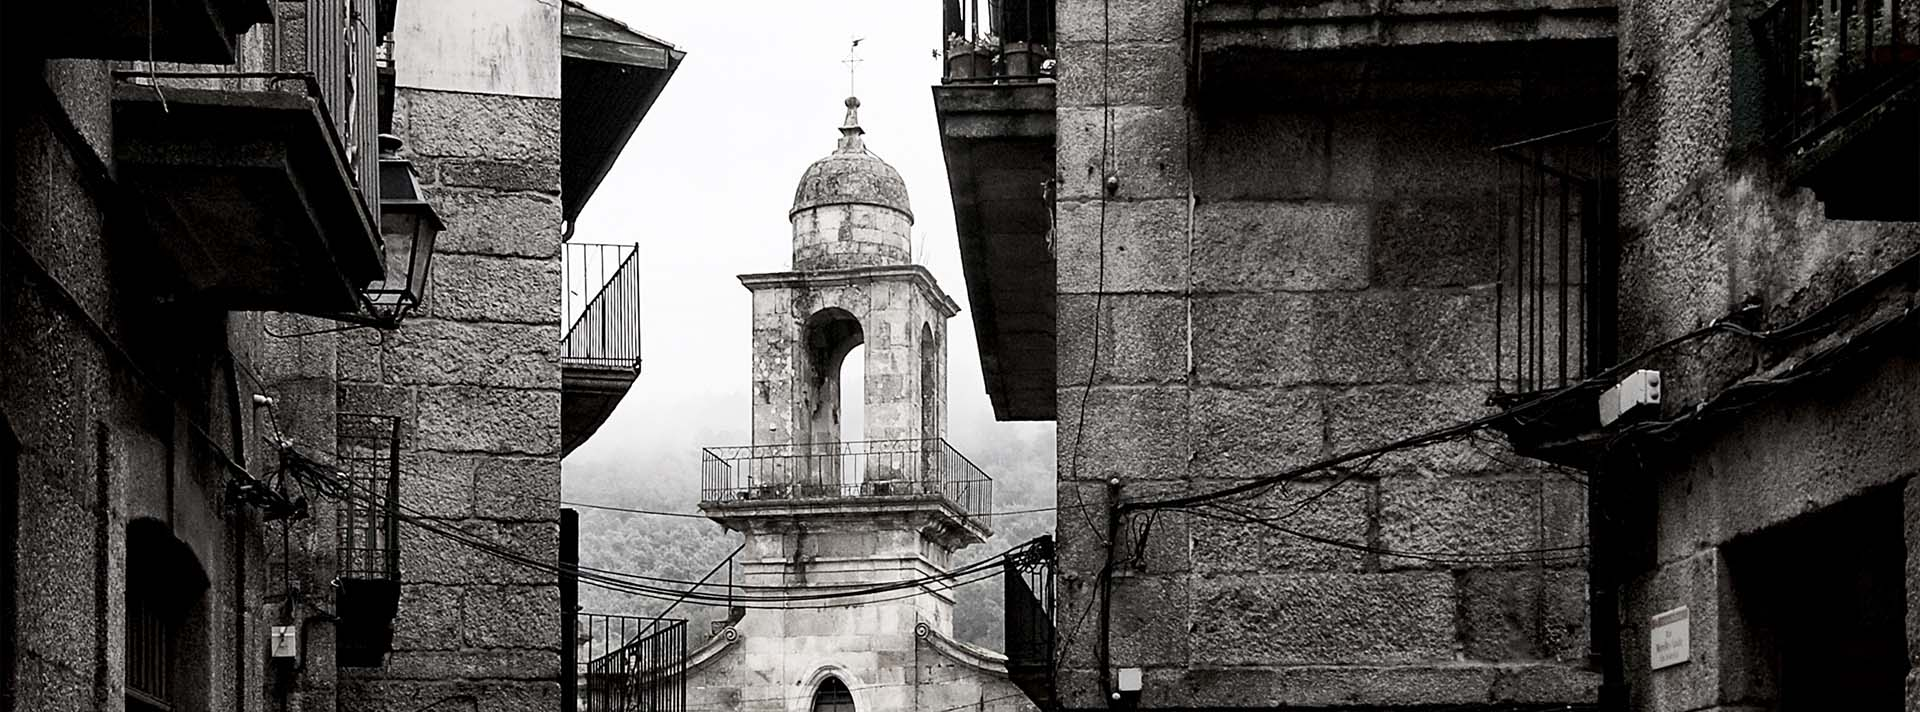 Rúas de Galicia